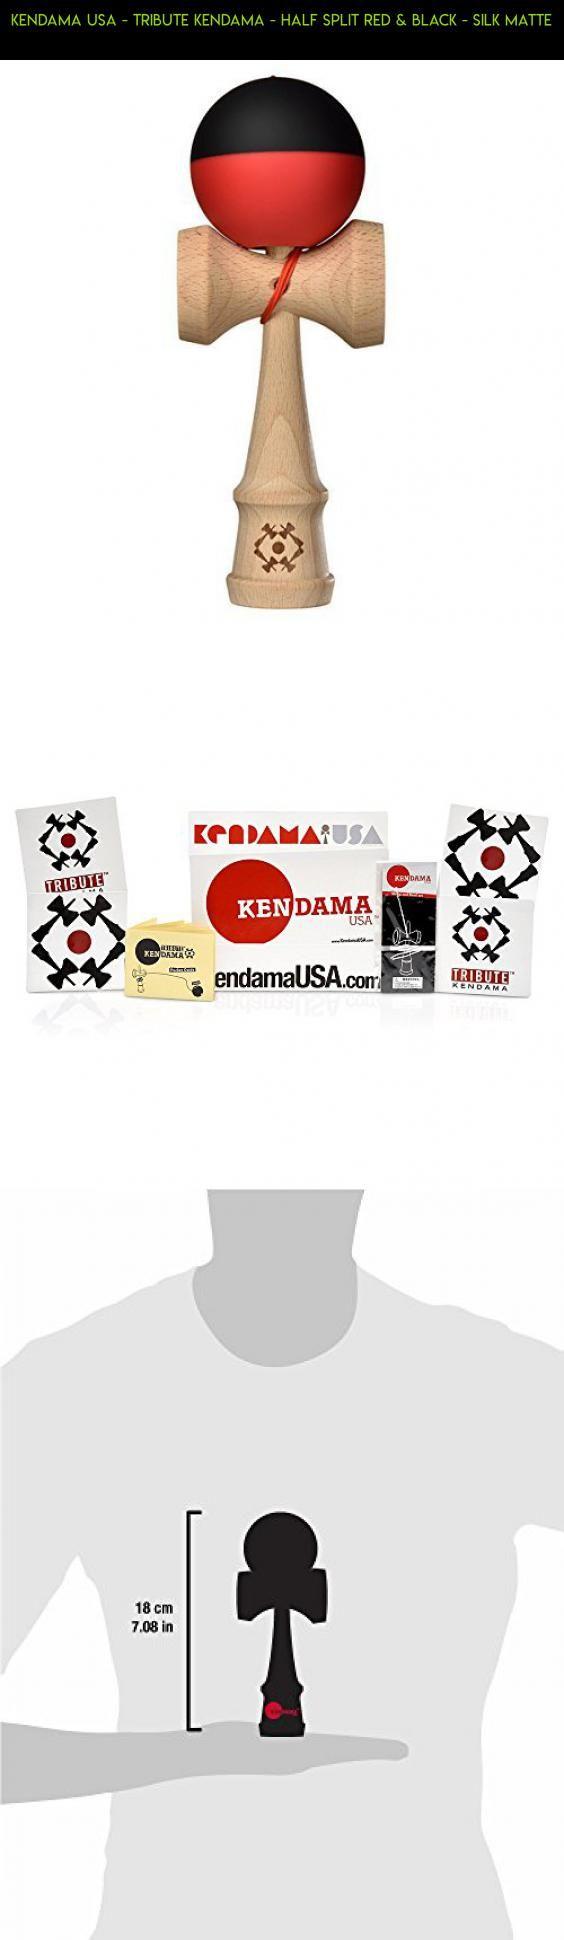 Kendama USA - Tribute Kendama - Half Split Red & Black - Silk Matte #tech #racing #technology #usa #drone #plans #parts #shopping #fpv #products #kit #gadgets #camera #kendama